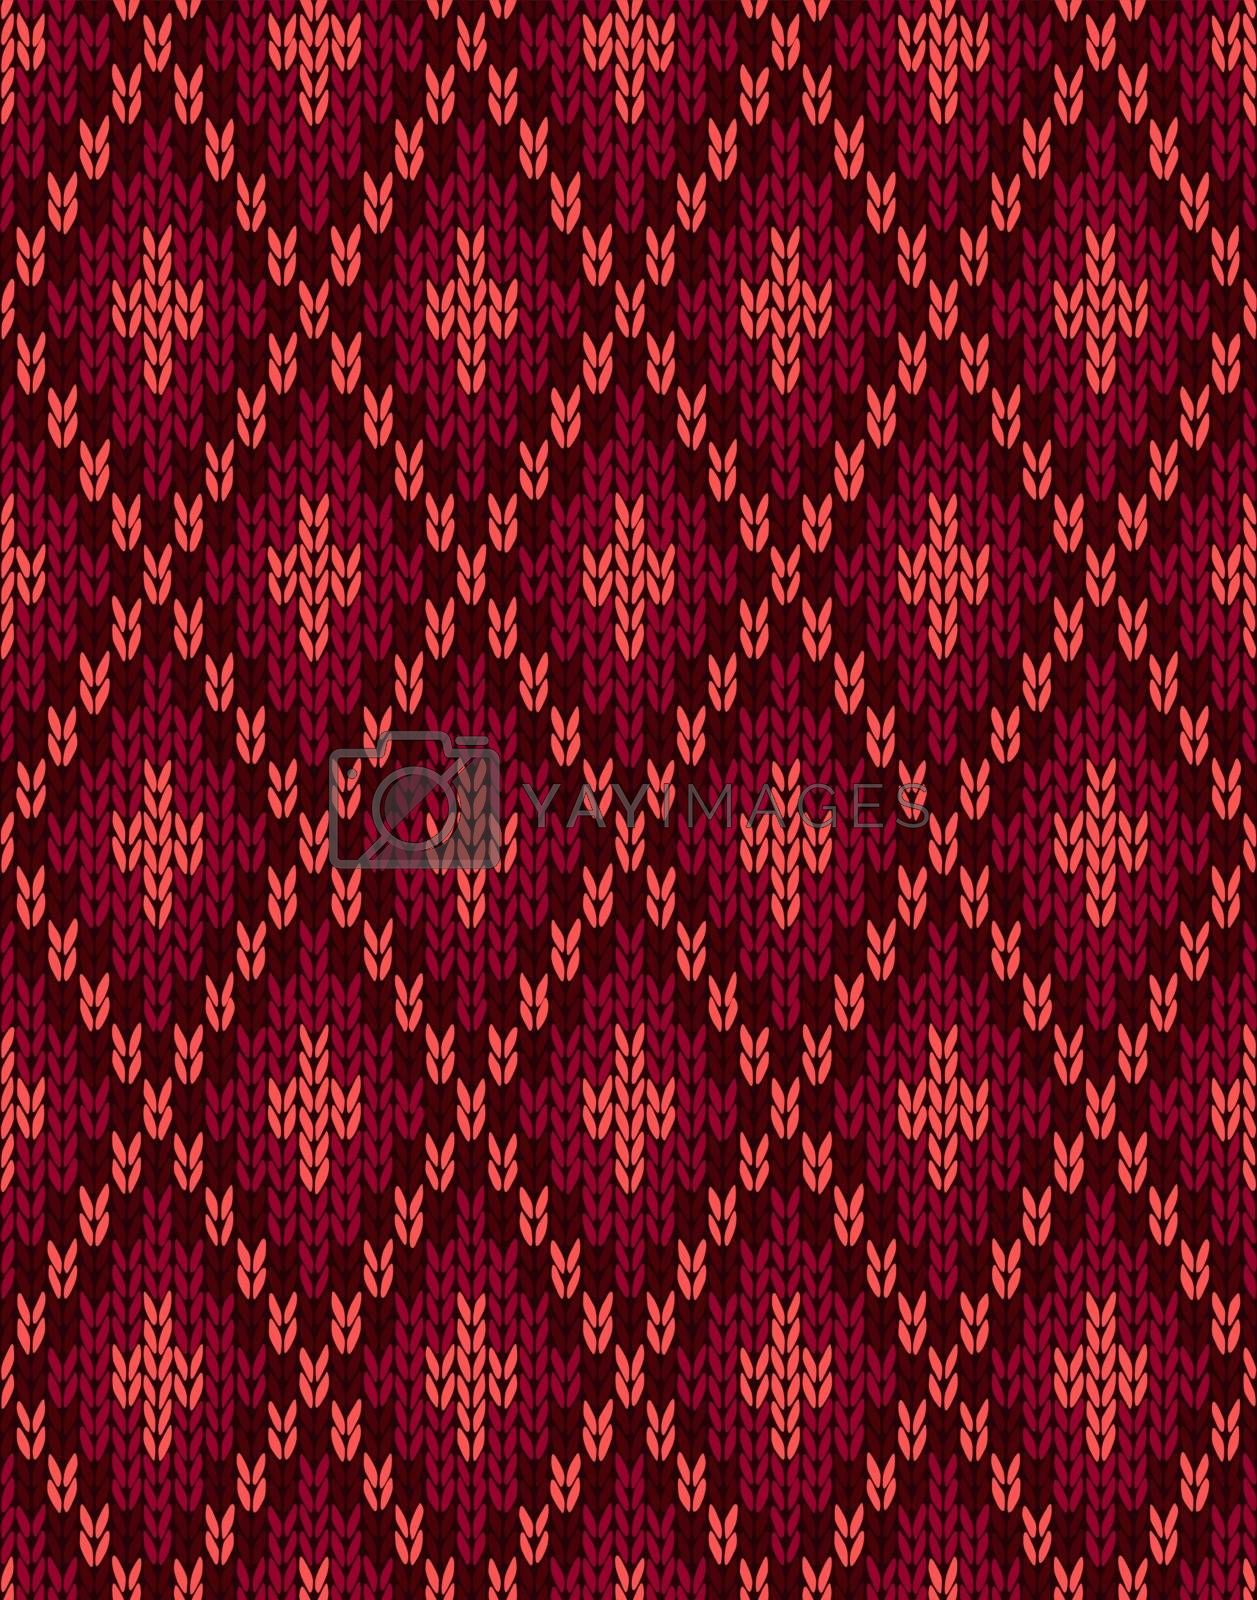 Seamless Knitwear Swedish Textile Pattern